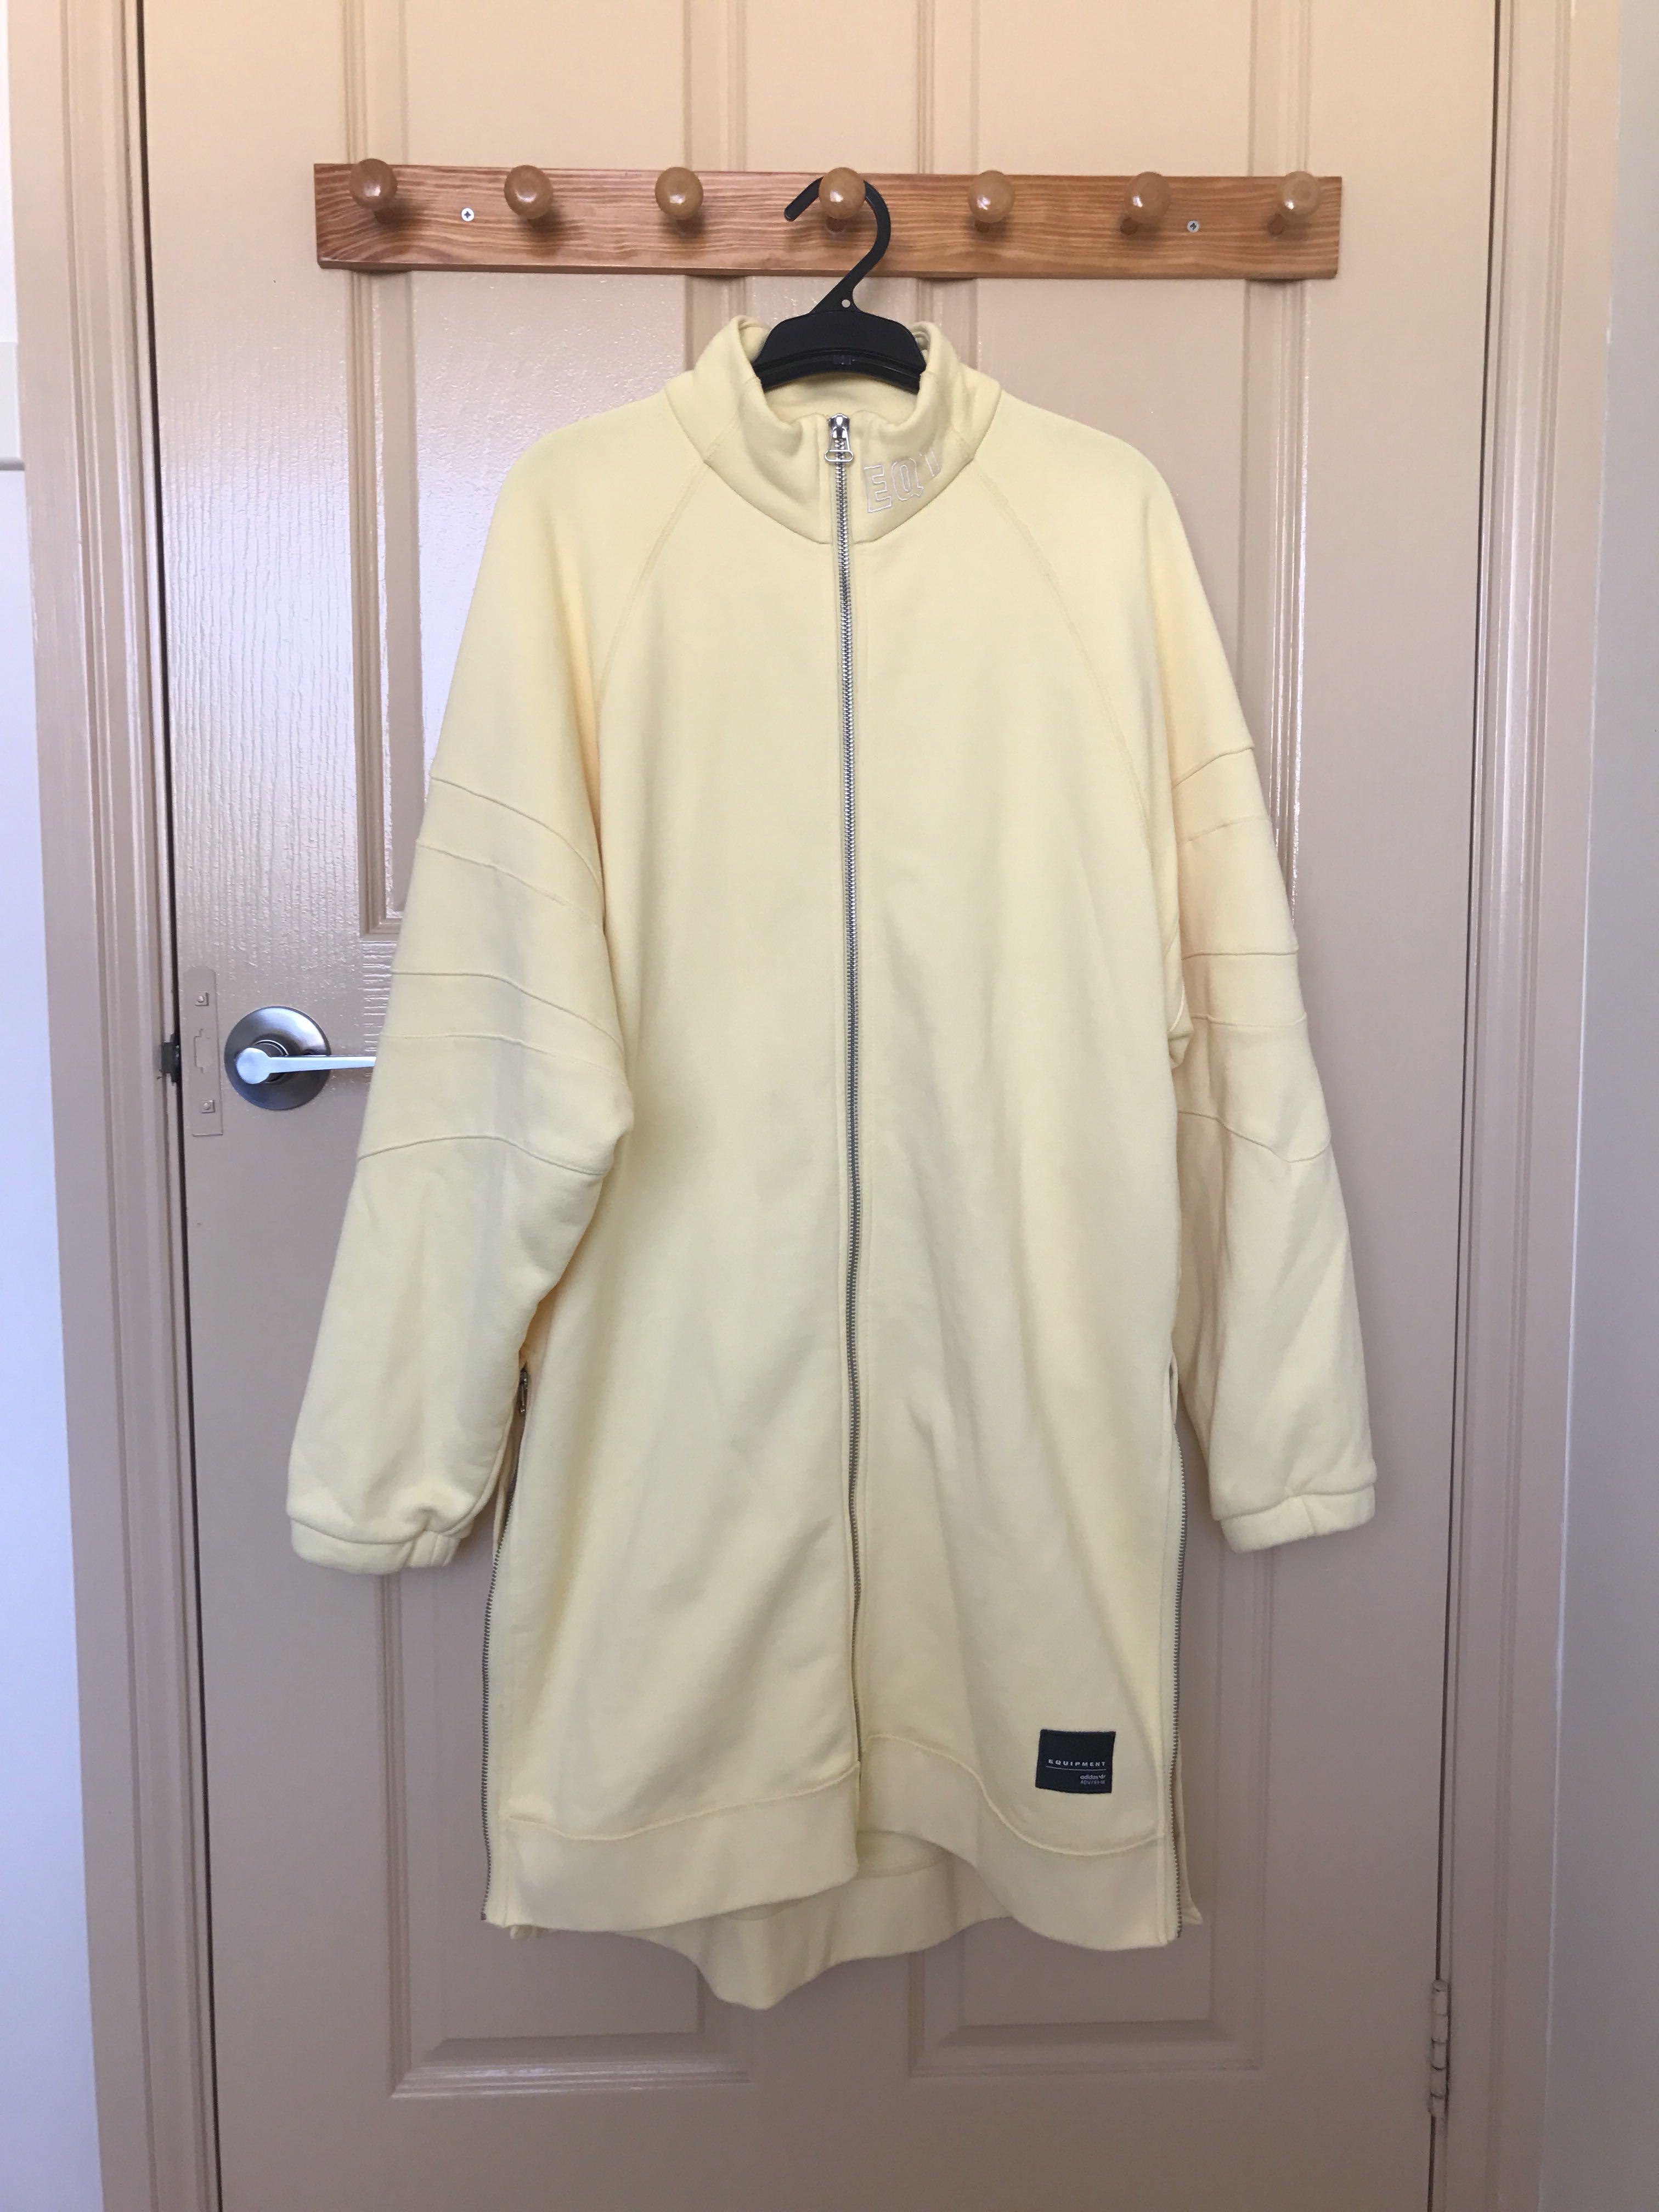 Adidas EQT yellow jacket